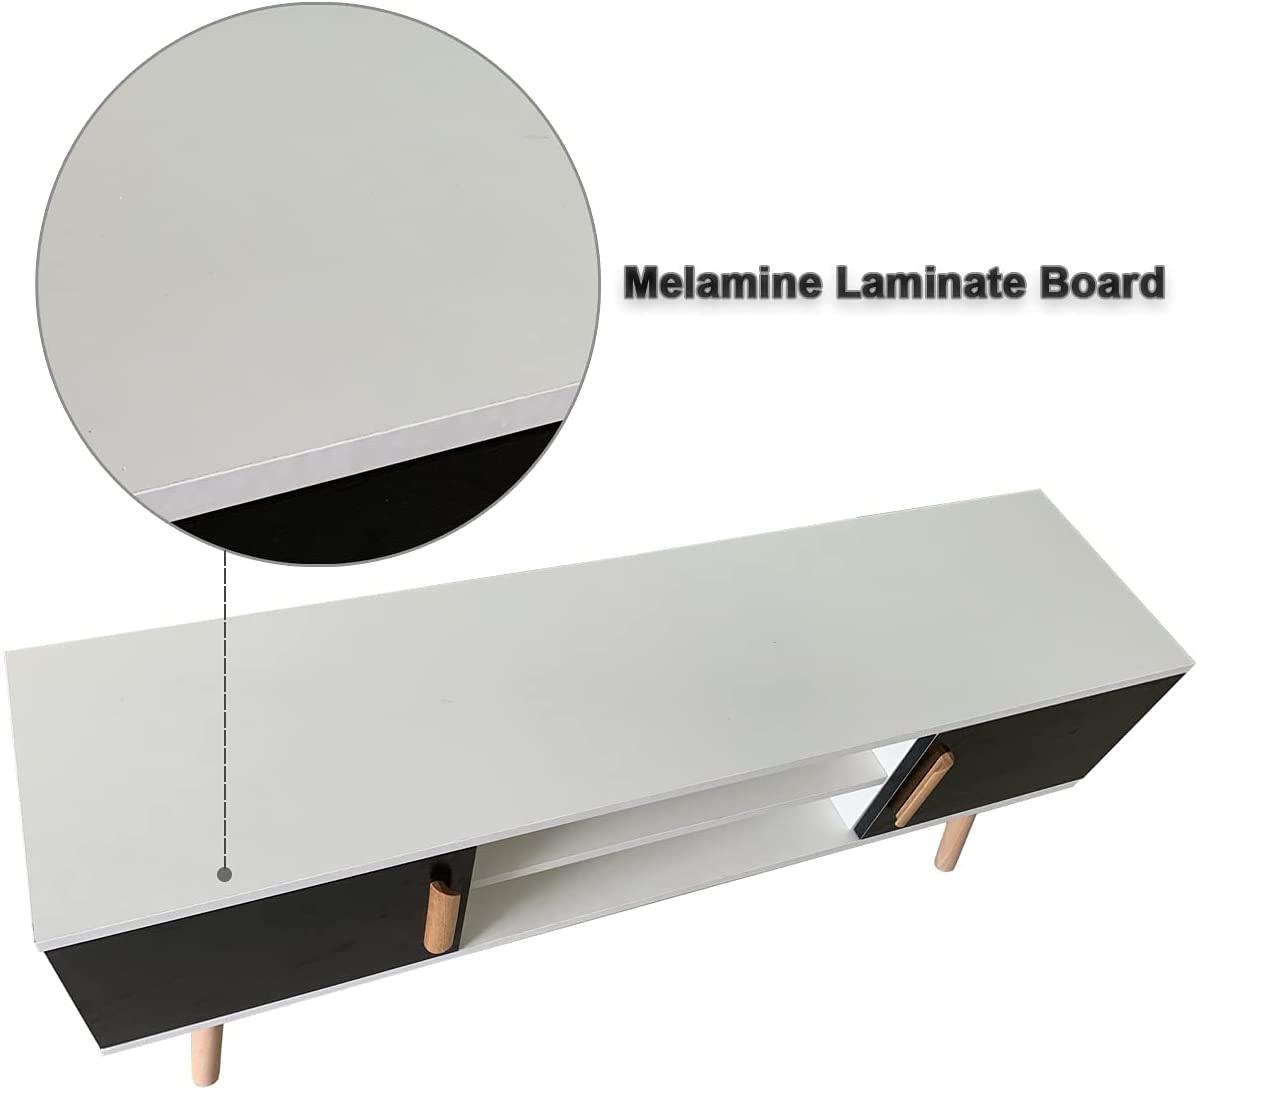 Best DIY Melamine laminating board for wooden cabinet with sholves design ideas